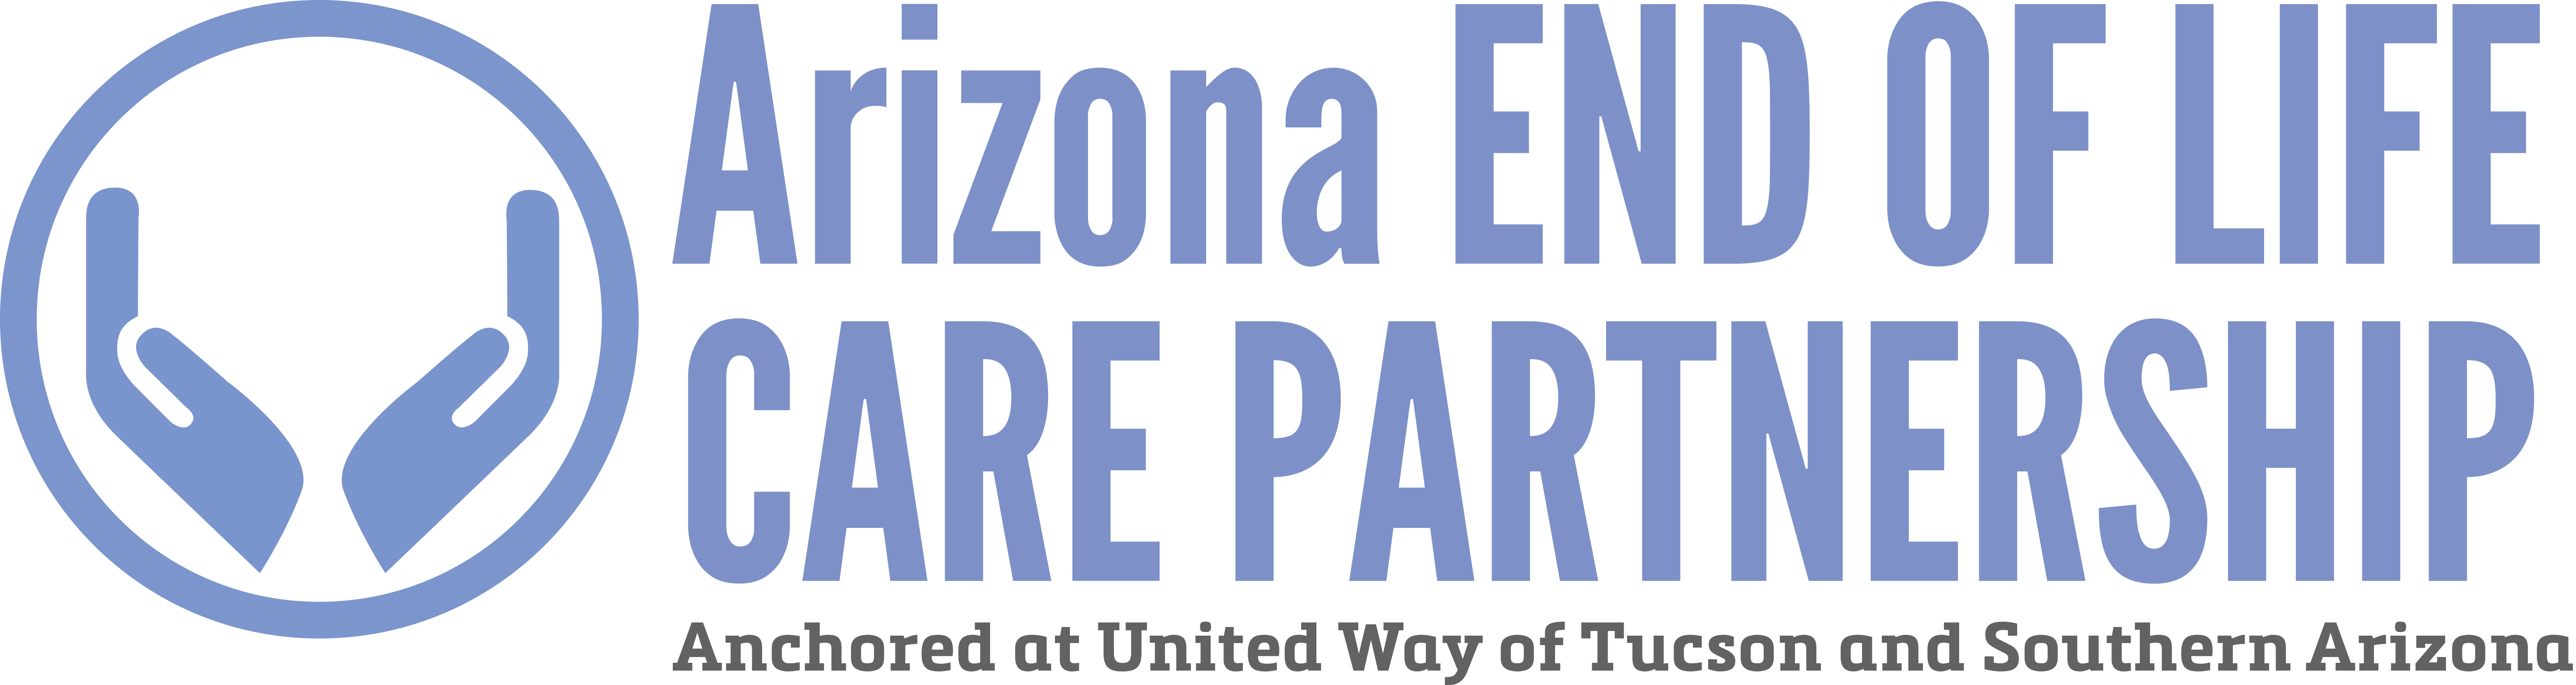 Arizona End of Life Care Partnership